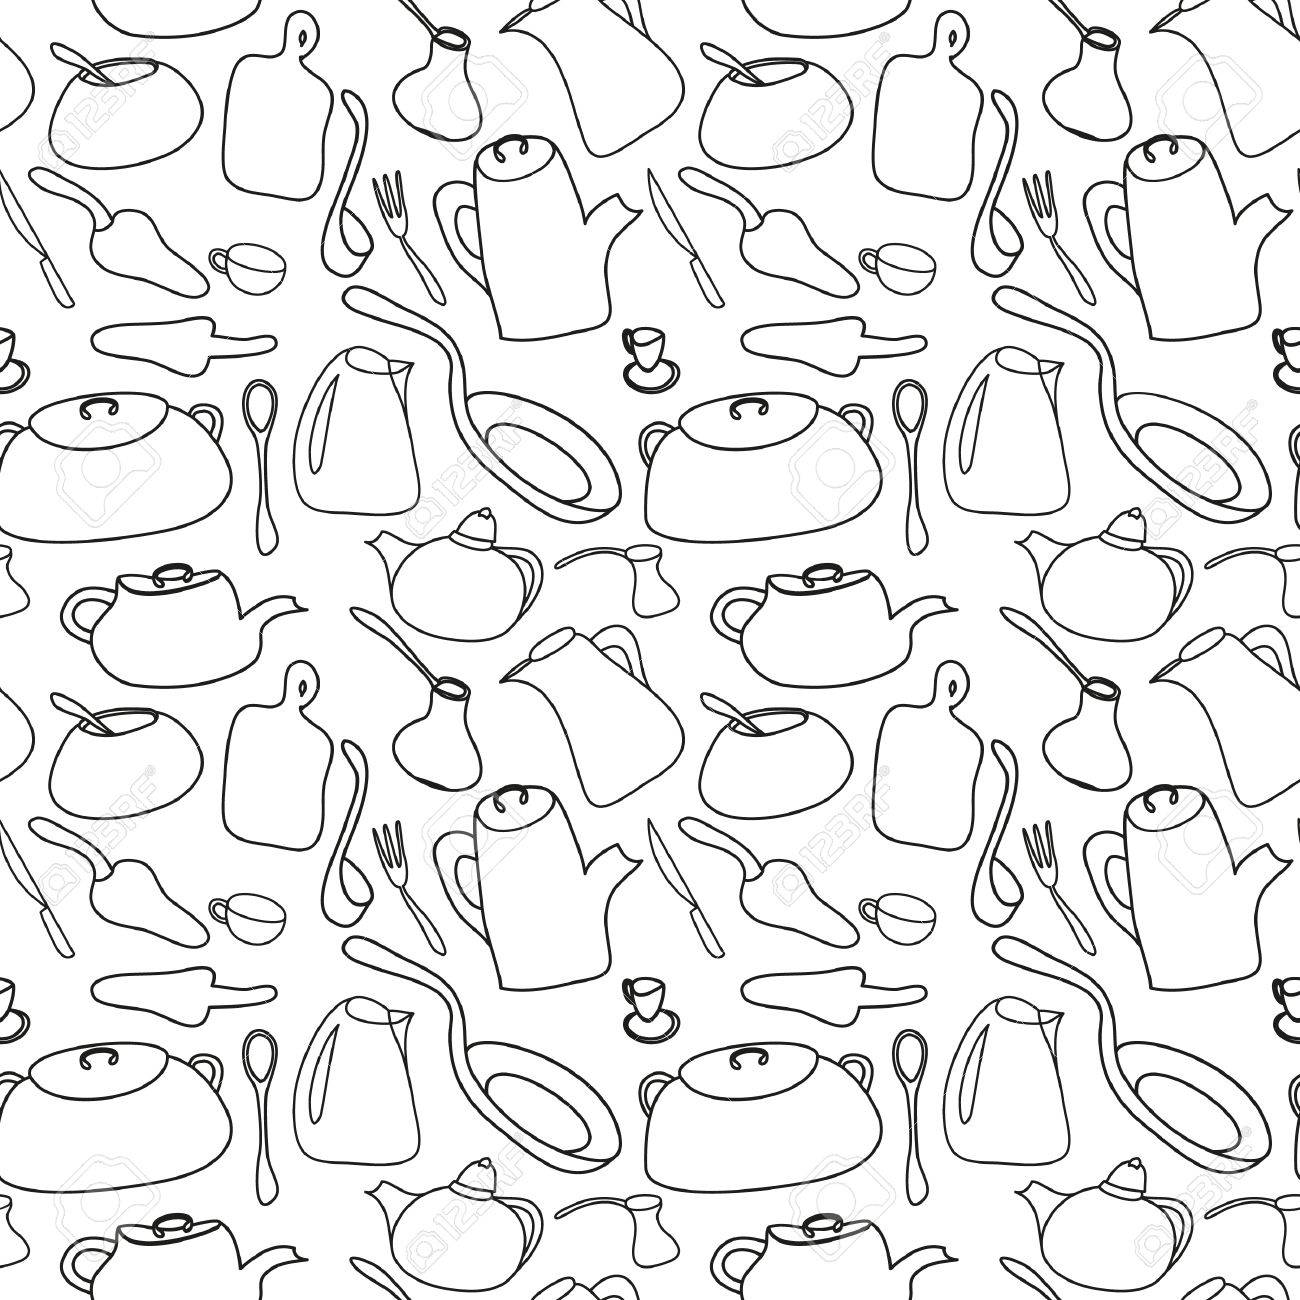 Kitchen Art Design Vector Illustration. Seamless Black And White ...